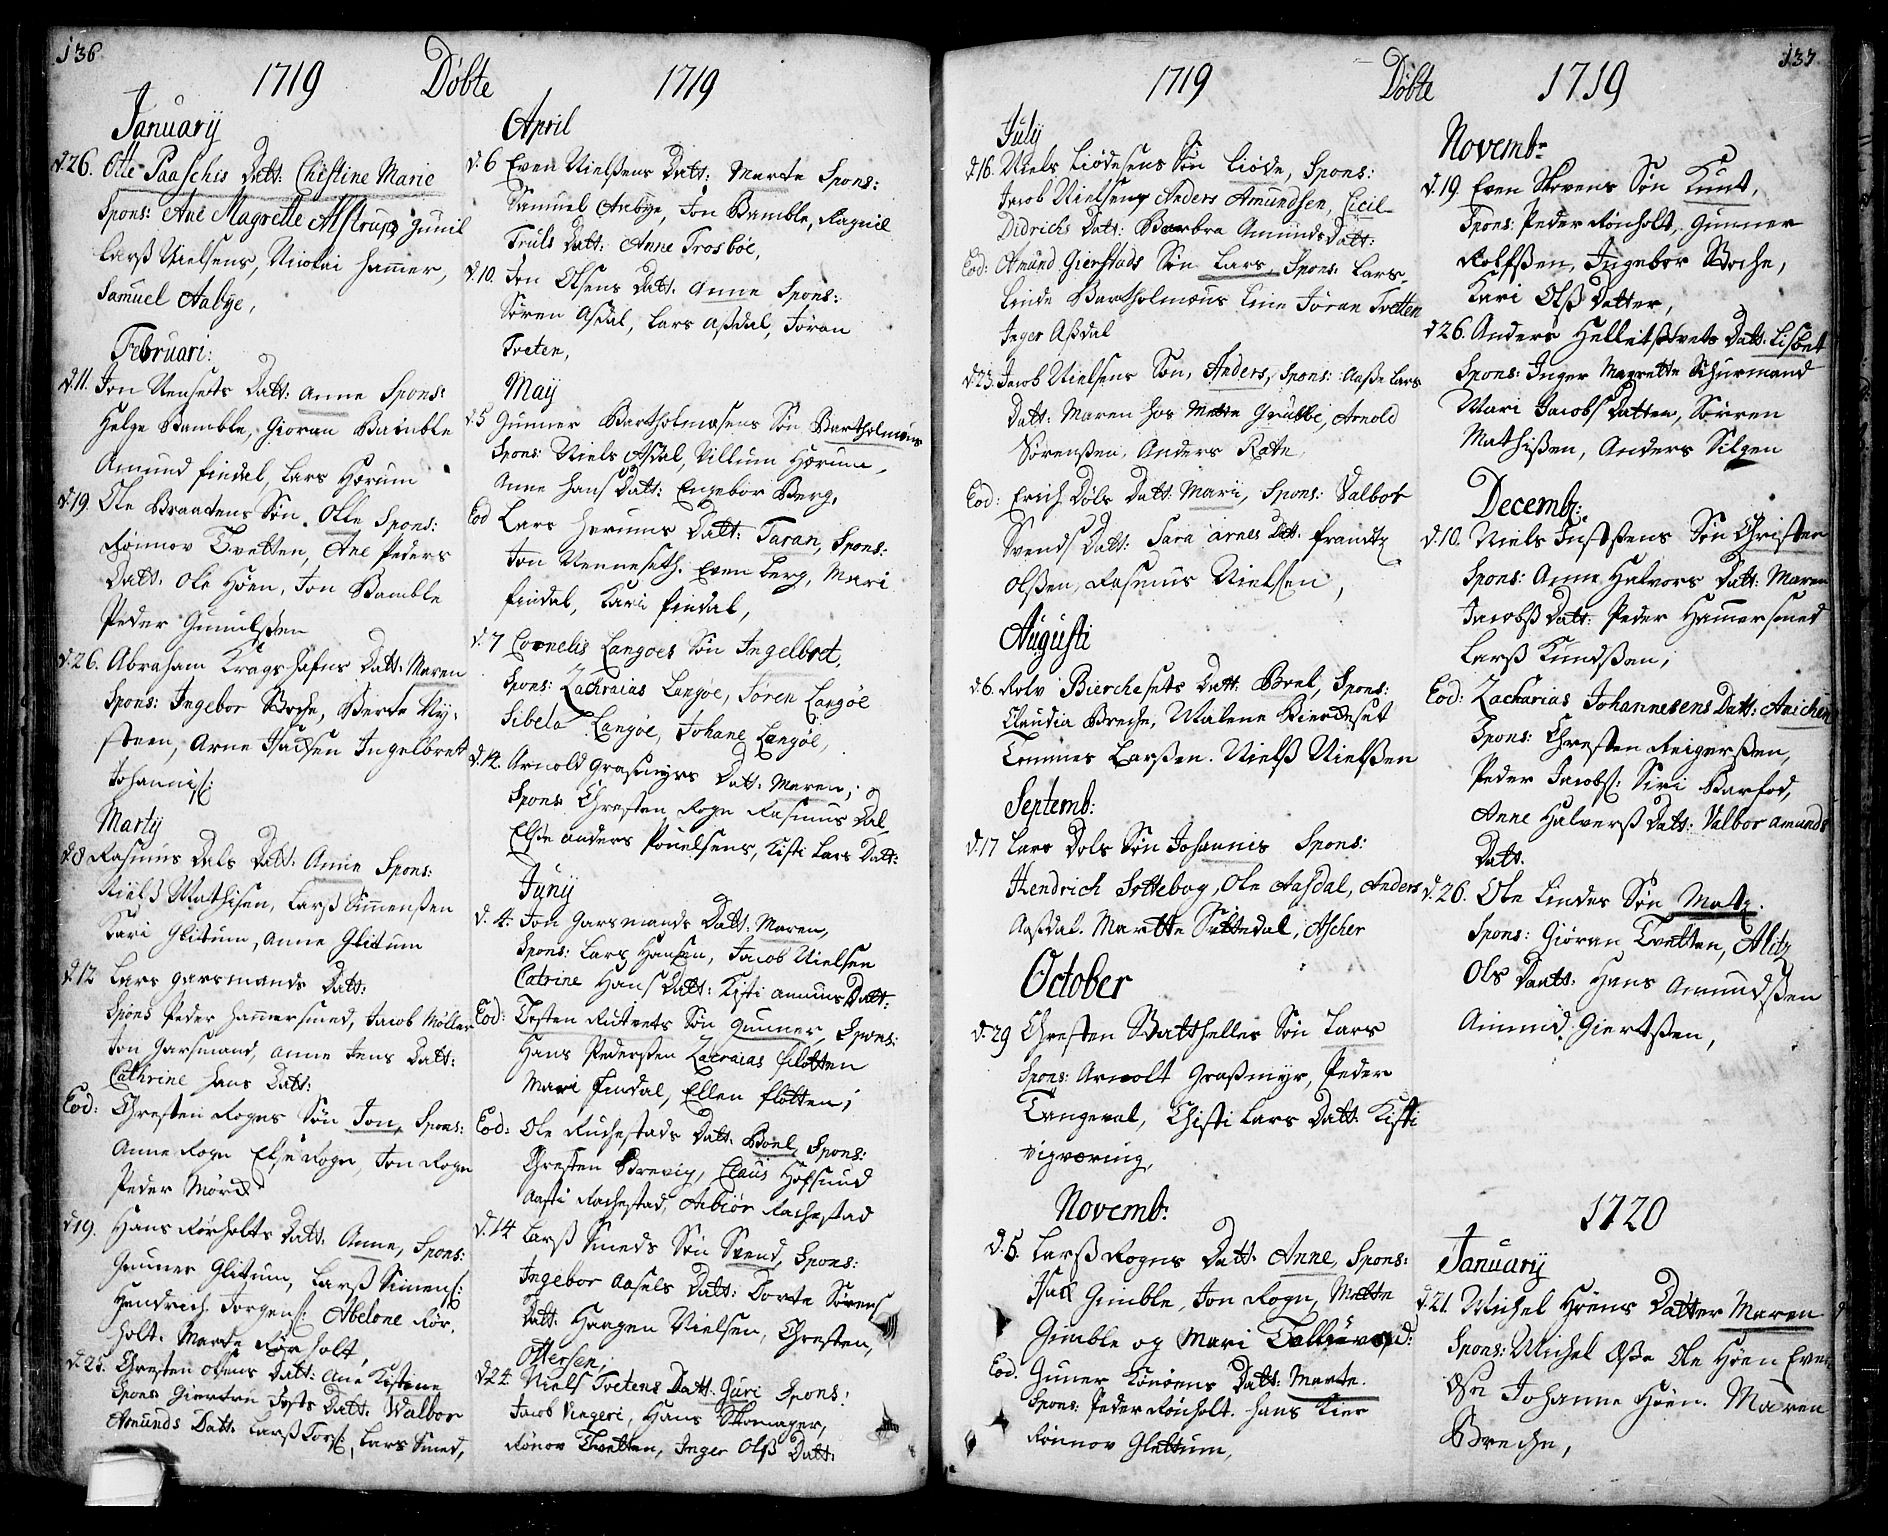 SAKO, Bamble kirkebøker, F/Fa/L0001: Ministerialbok nr. I 1, 1702-1774, s. 136-137